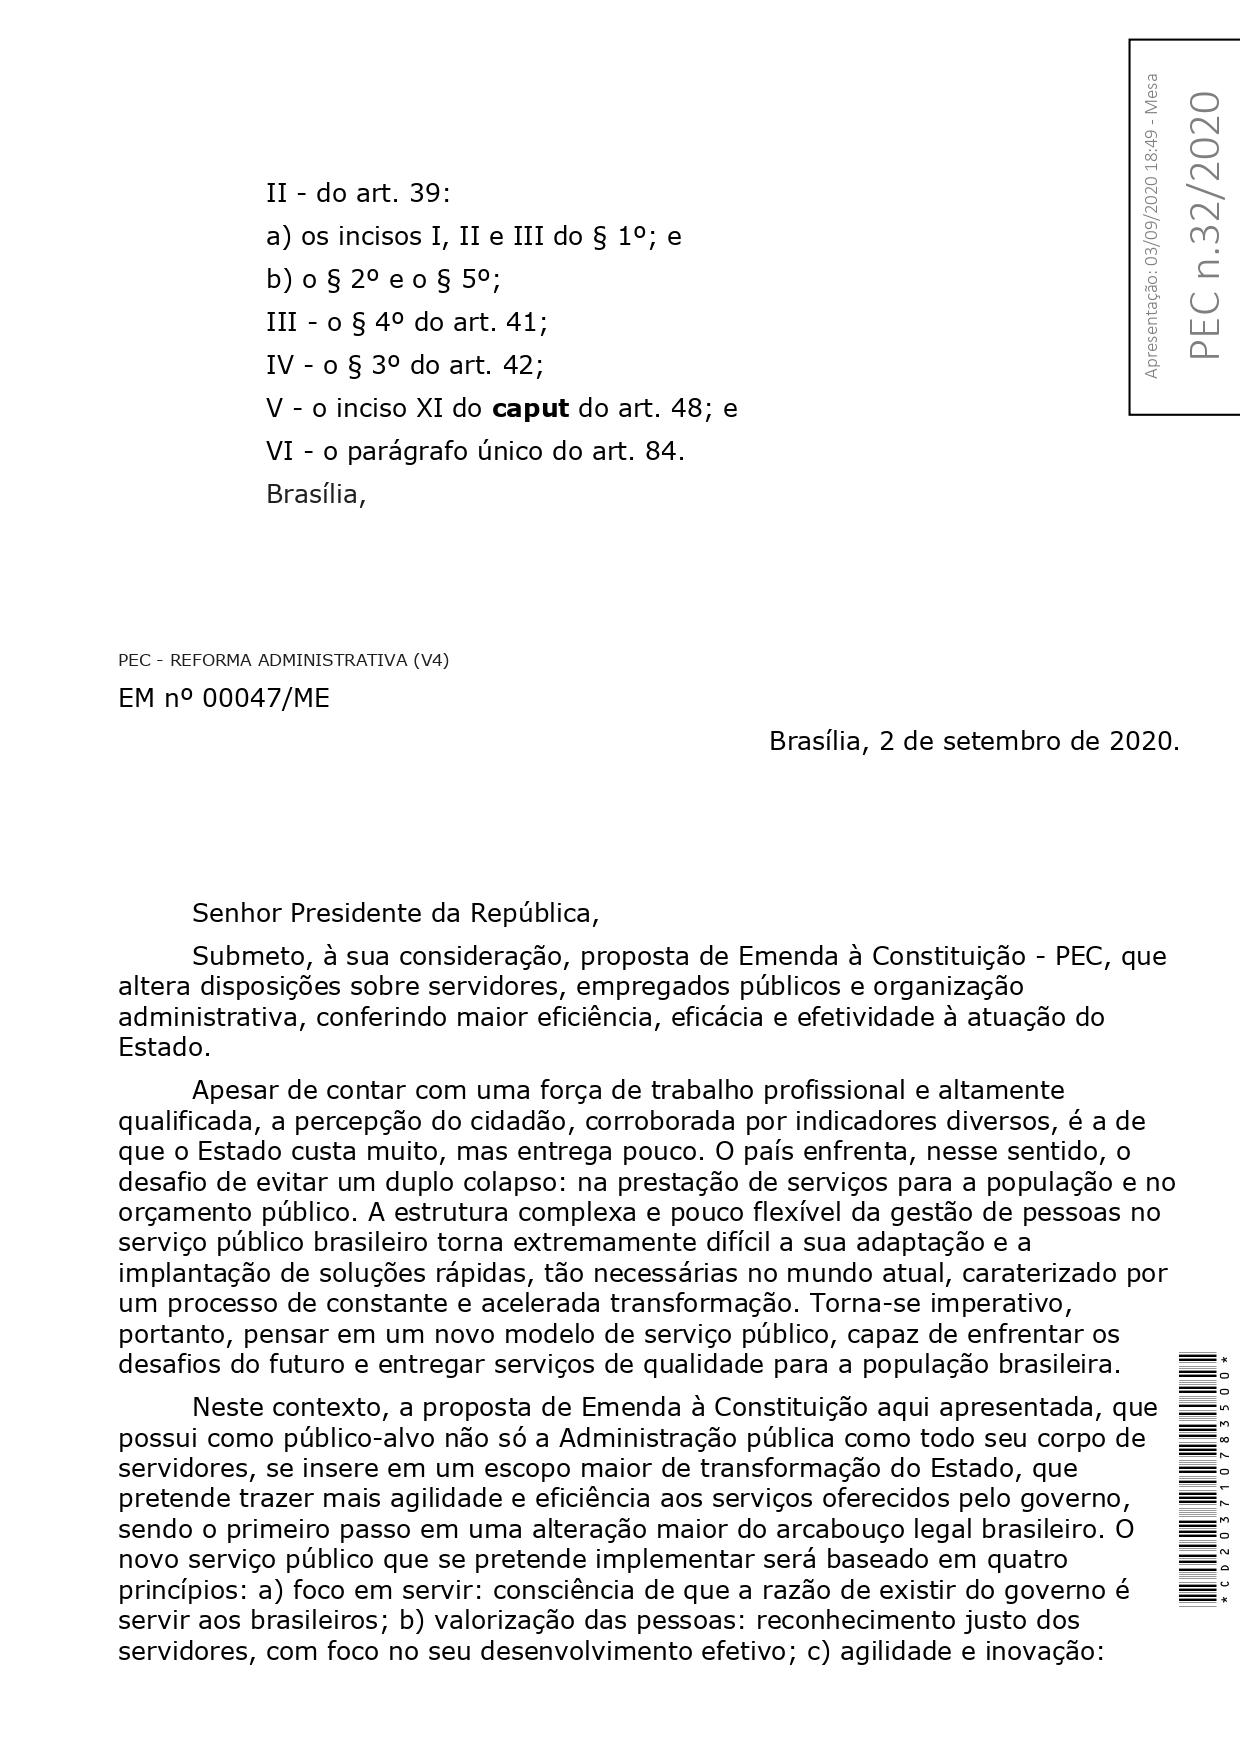 PEC-32-2020_page-0012.jpg